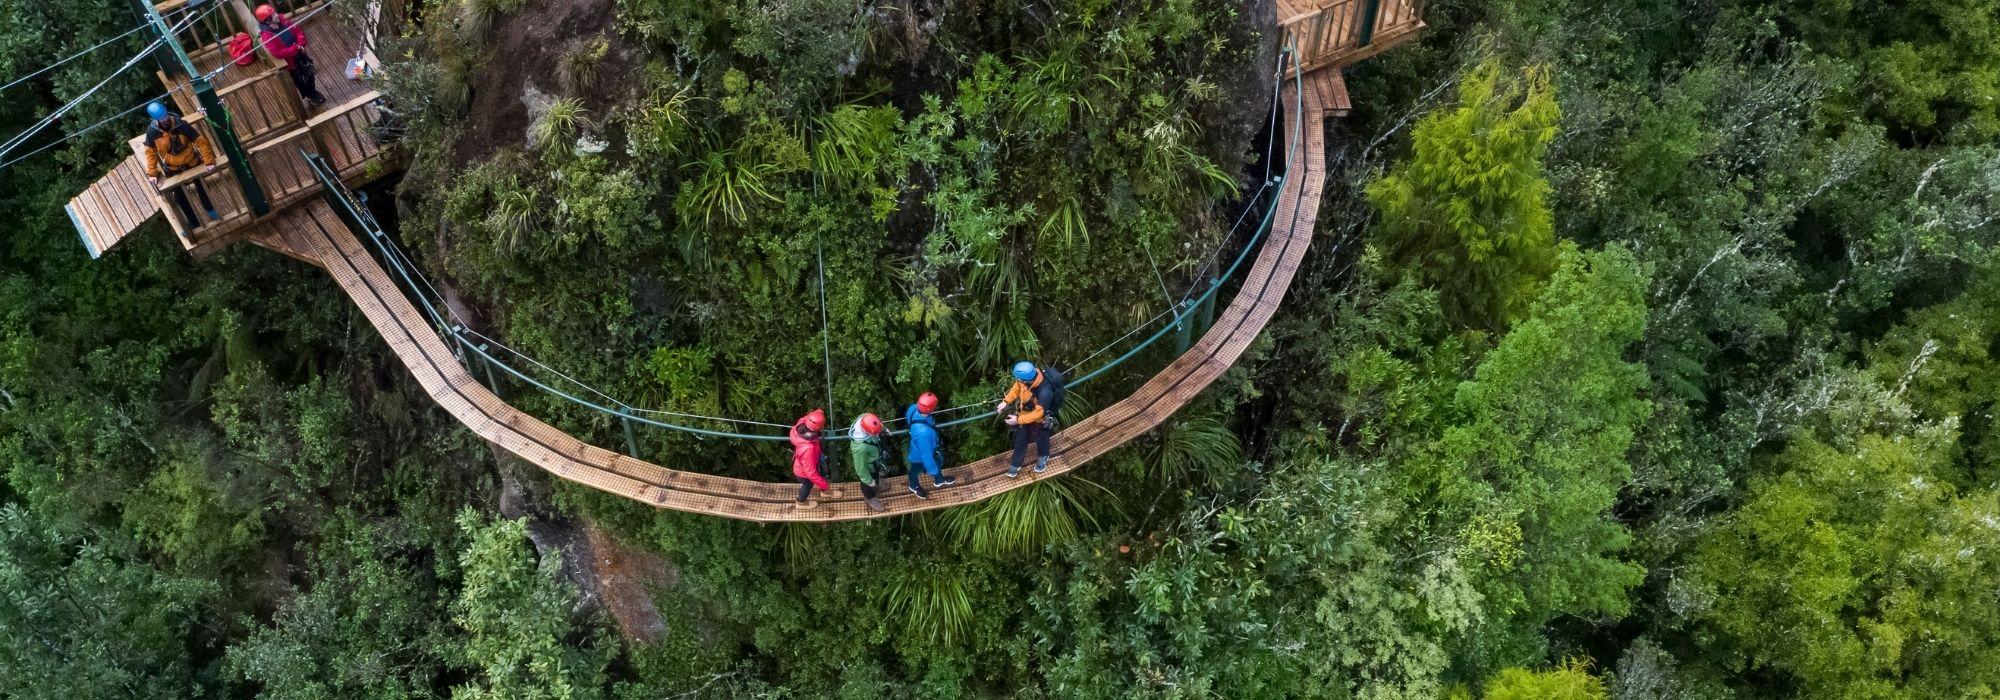 Rotorua is perfect for a microadventure